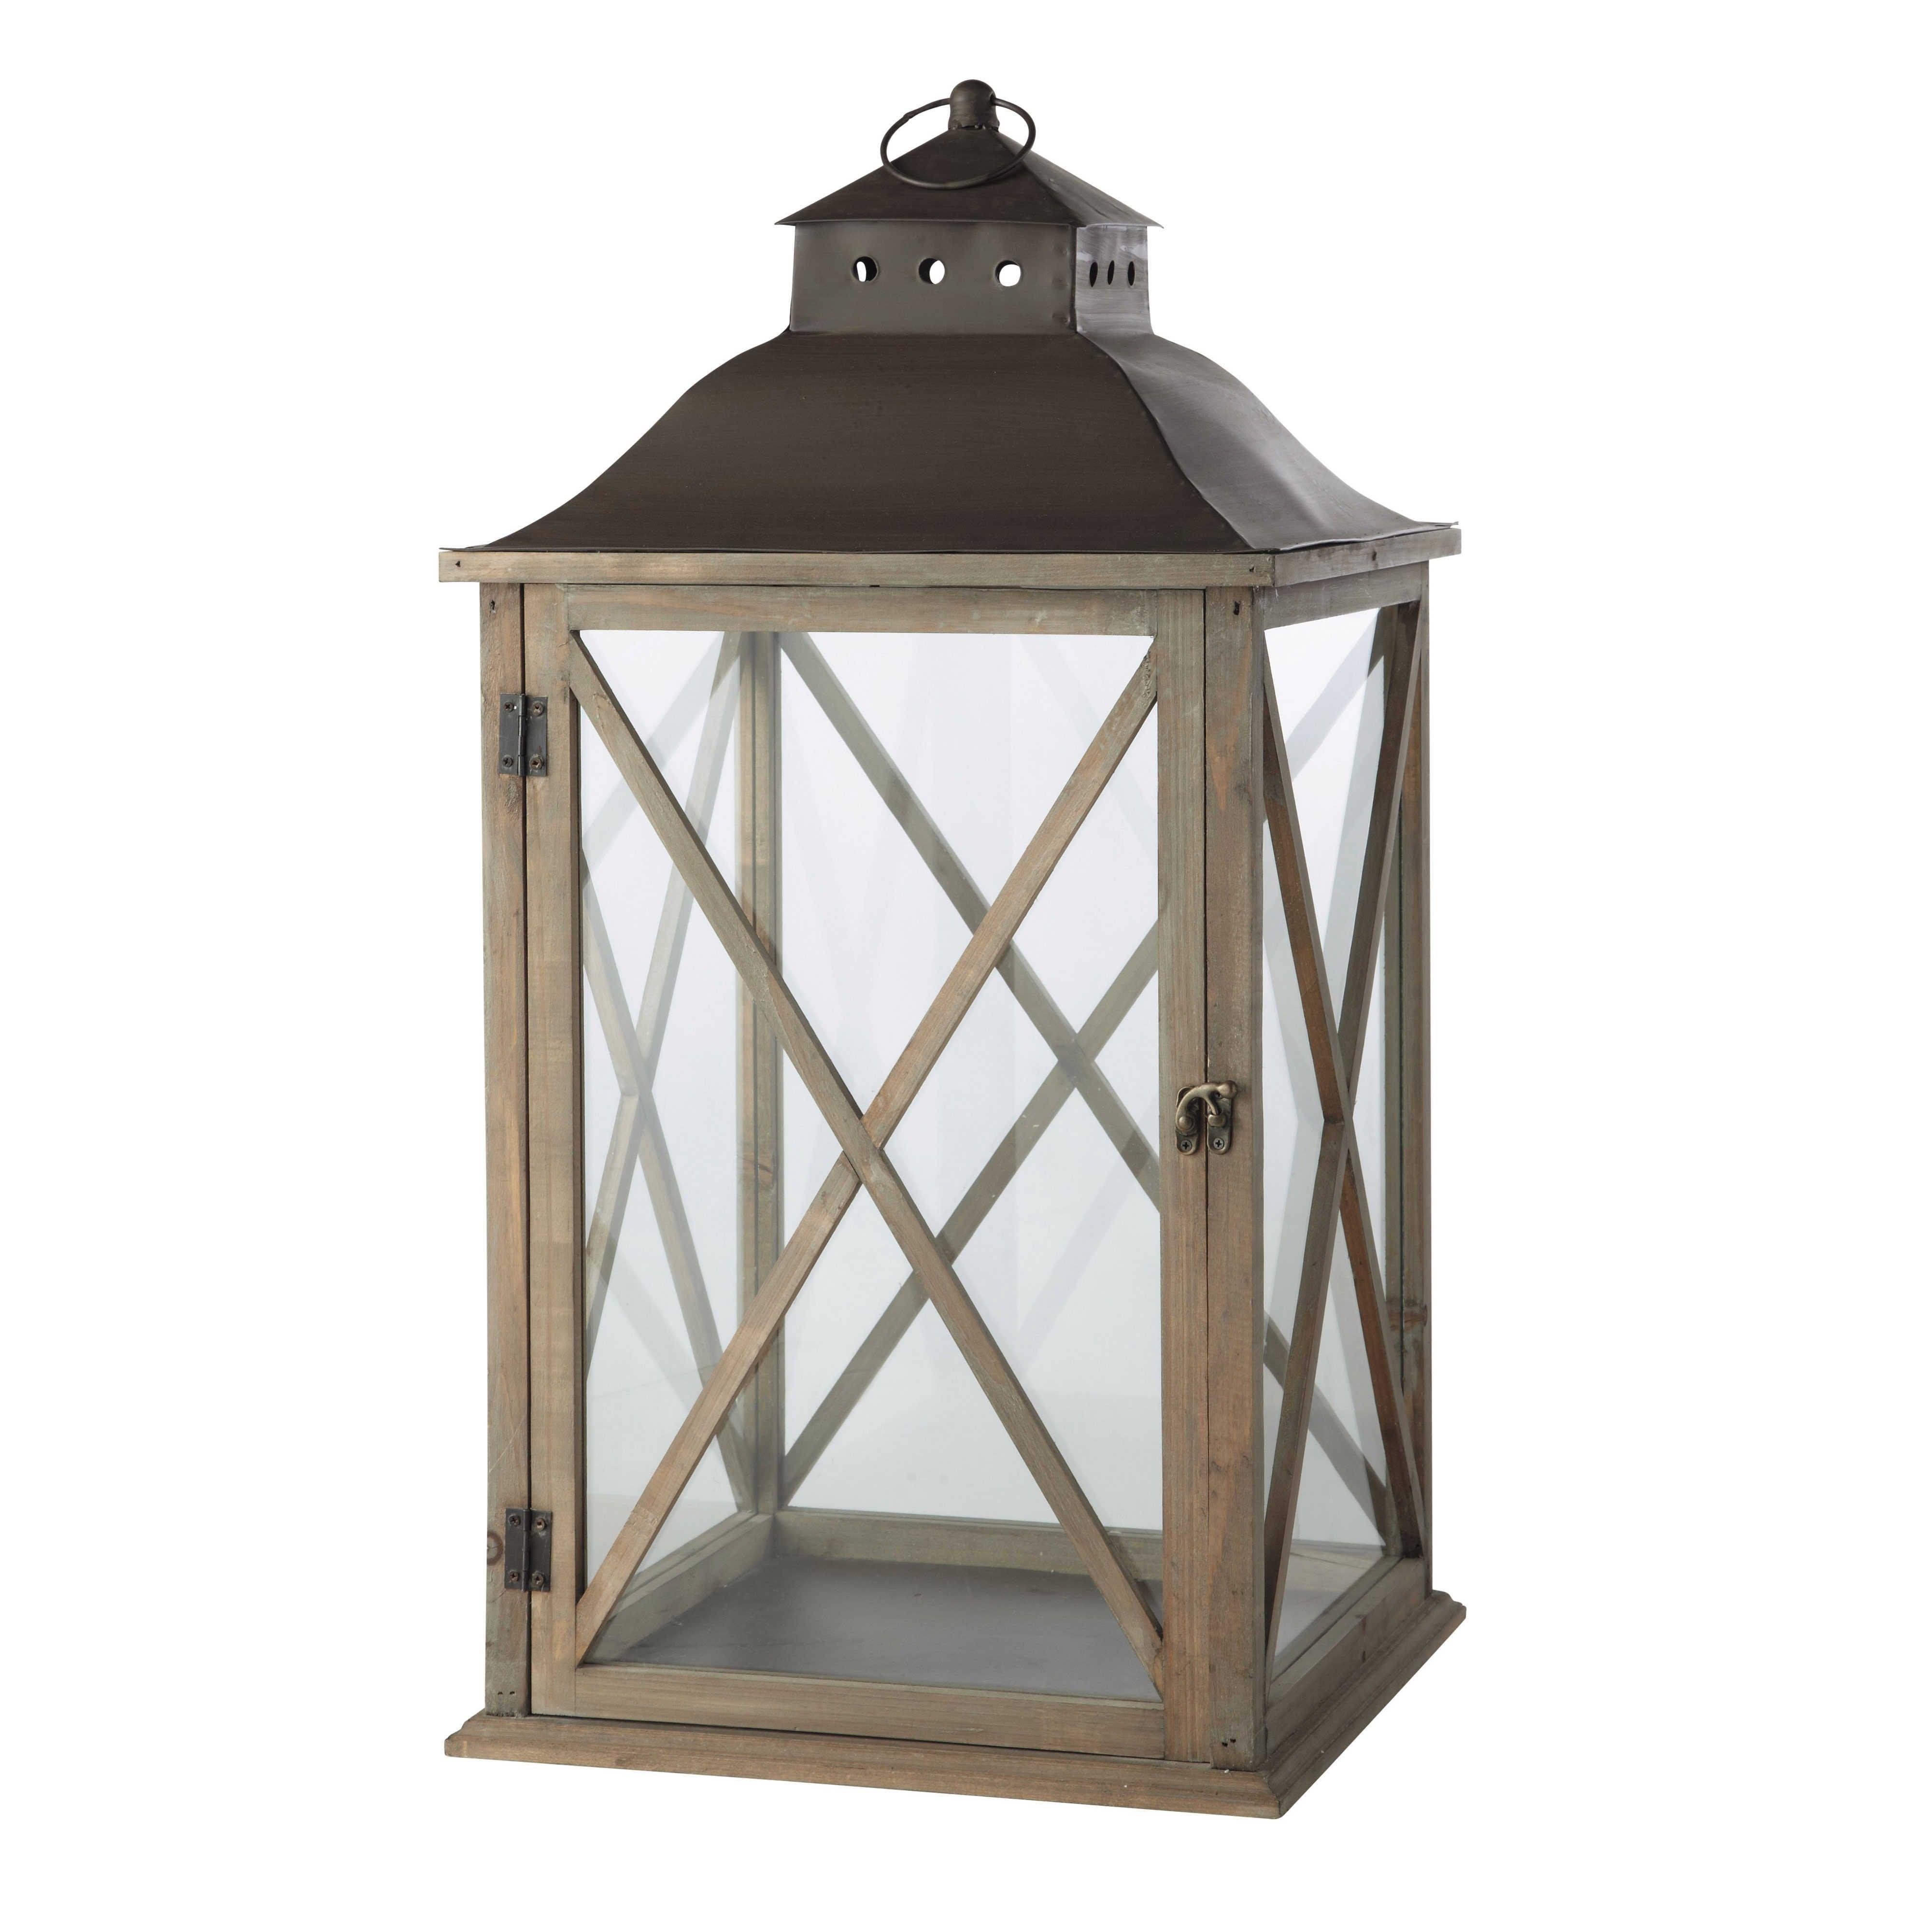 Grey Wood Garden Lantern H 72Cm | Garden Lanterns, Wood Gardens And pertaining to Outdoor Grey Lanterns (Image 7 of 20)